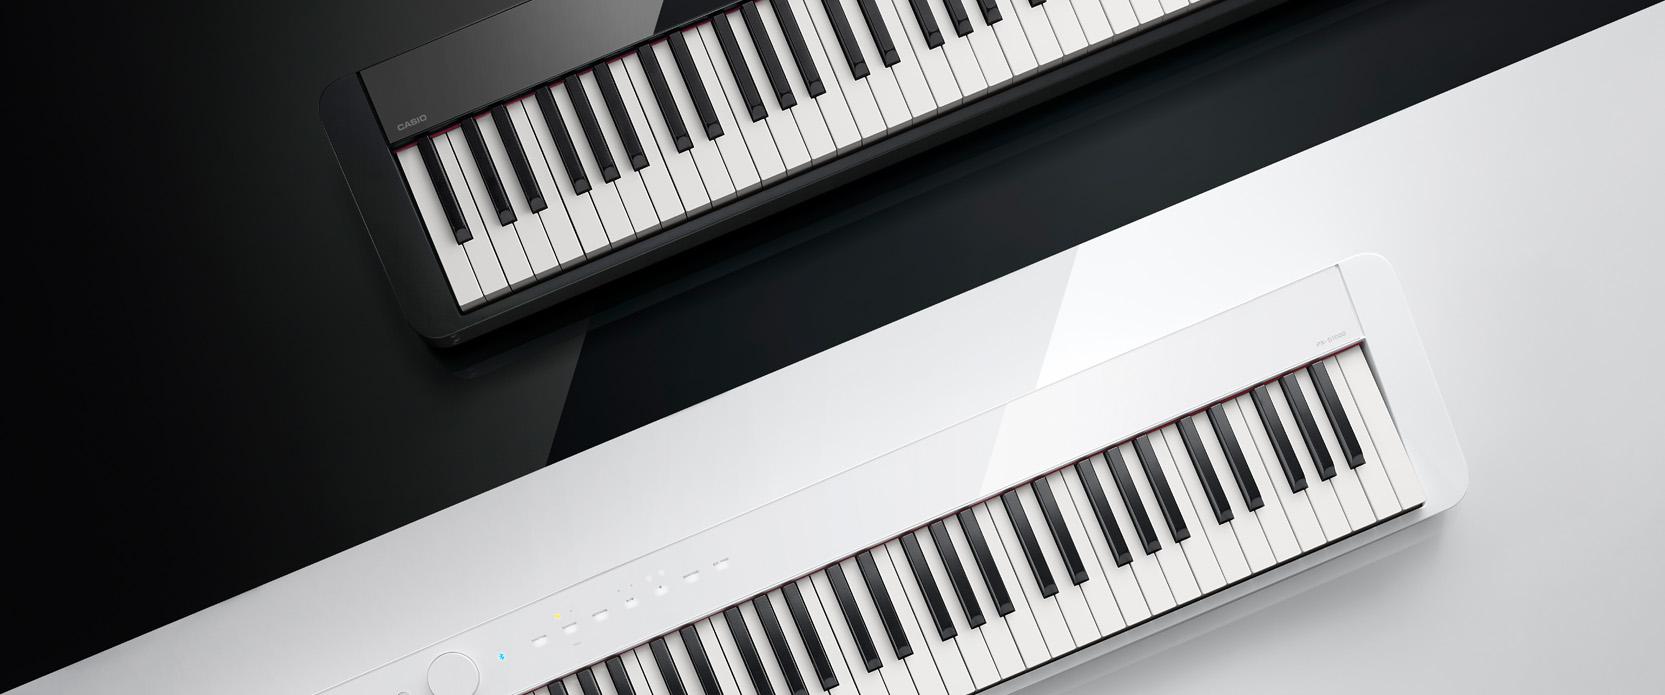 portable - DIGITAL PIANOSSLIM. STYLISH. SMART.